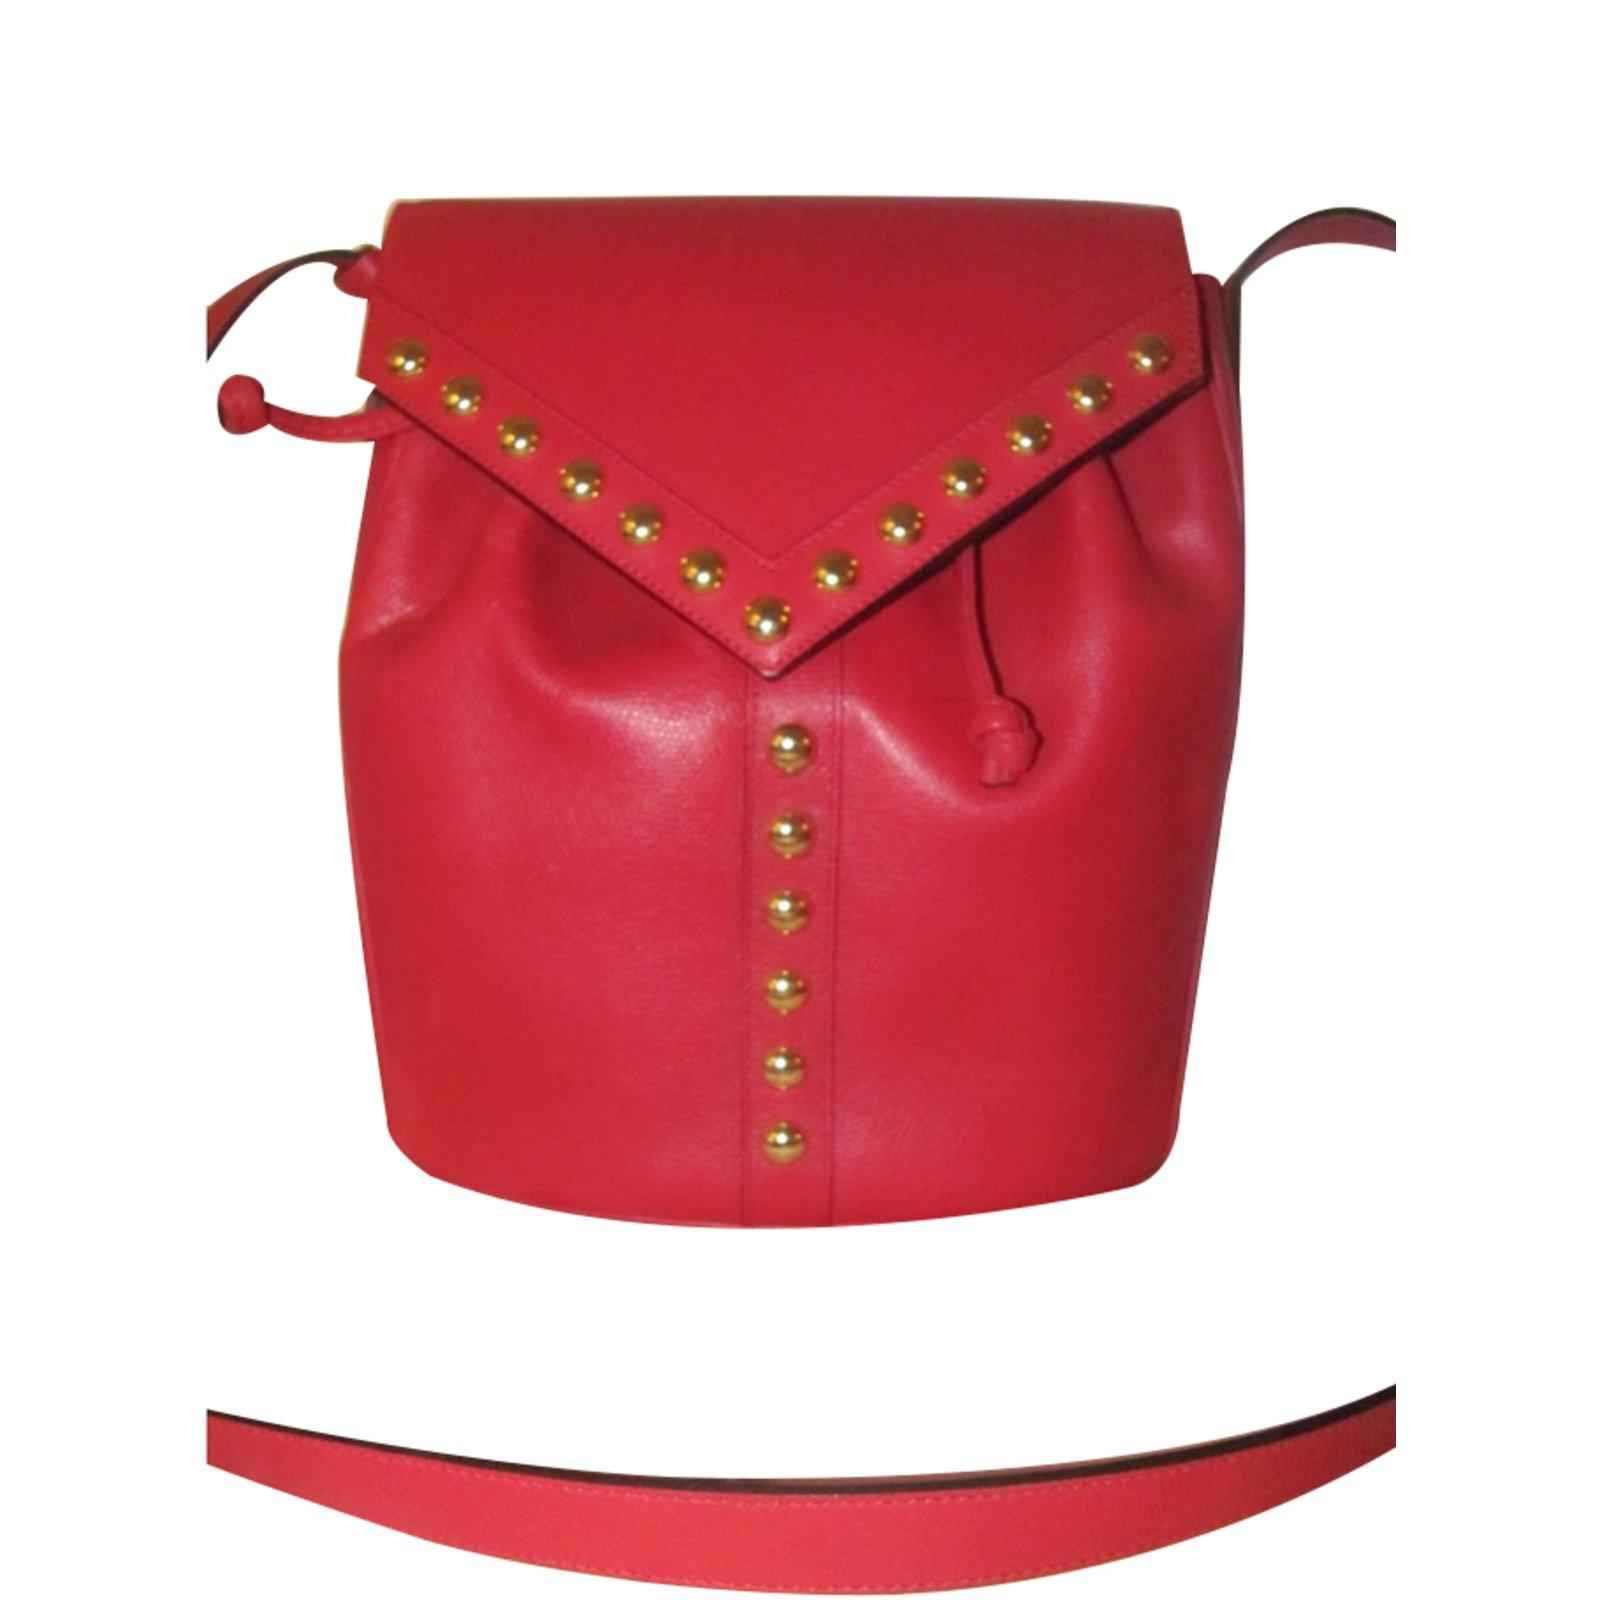 cc4df7607fa6 Yves Saint Laurent Handbag Handbags Leather Red ref.27765 - Joli Closet